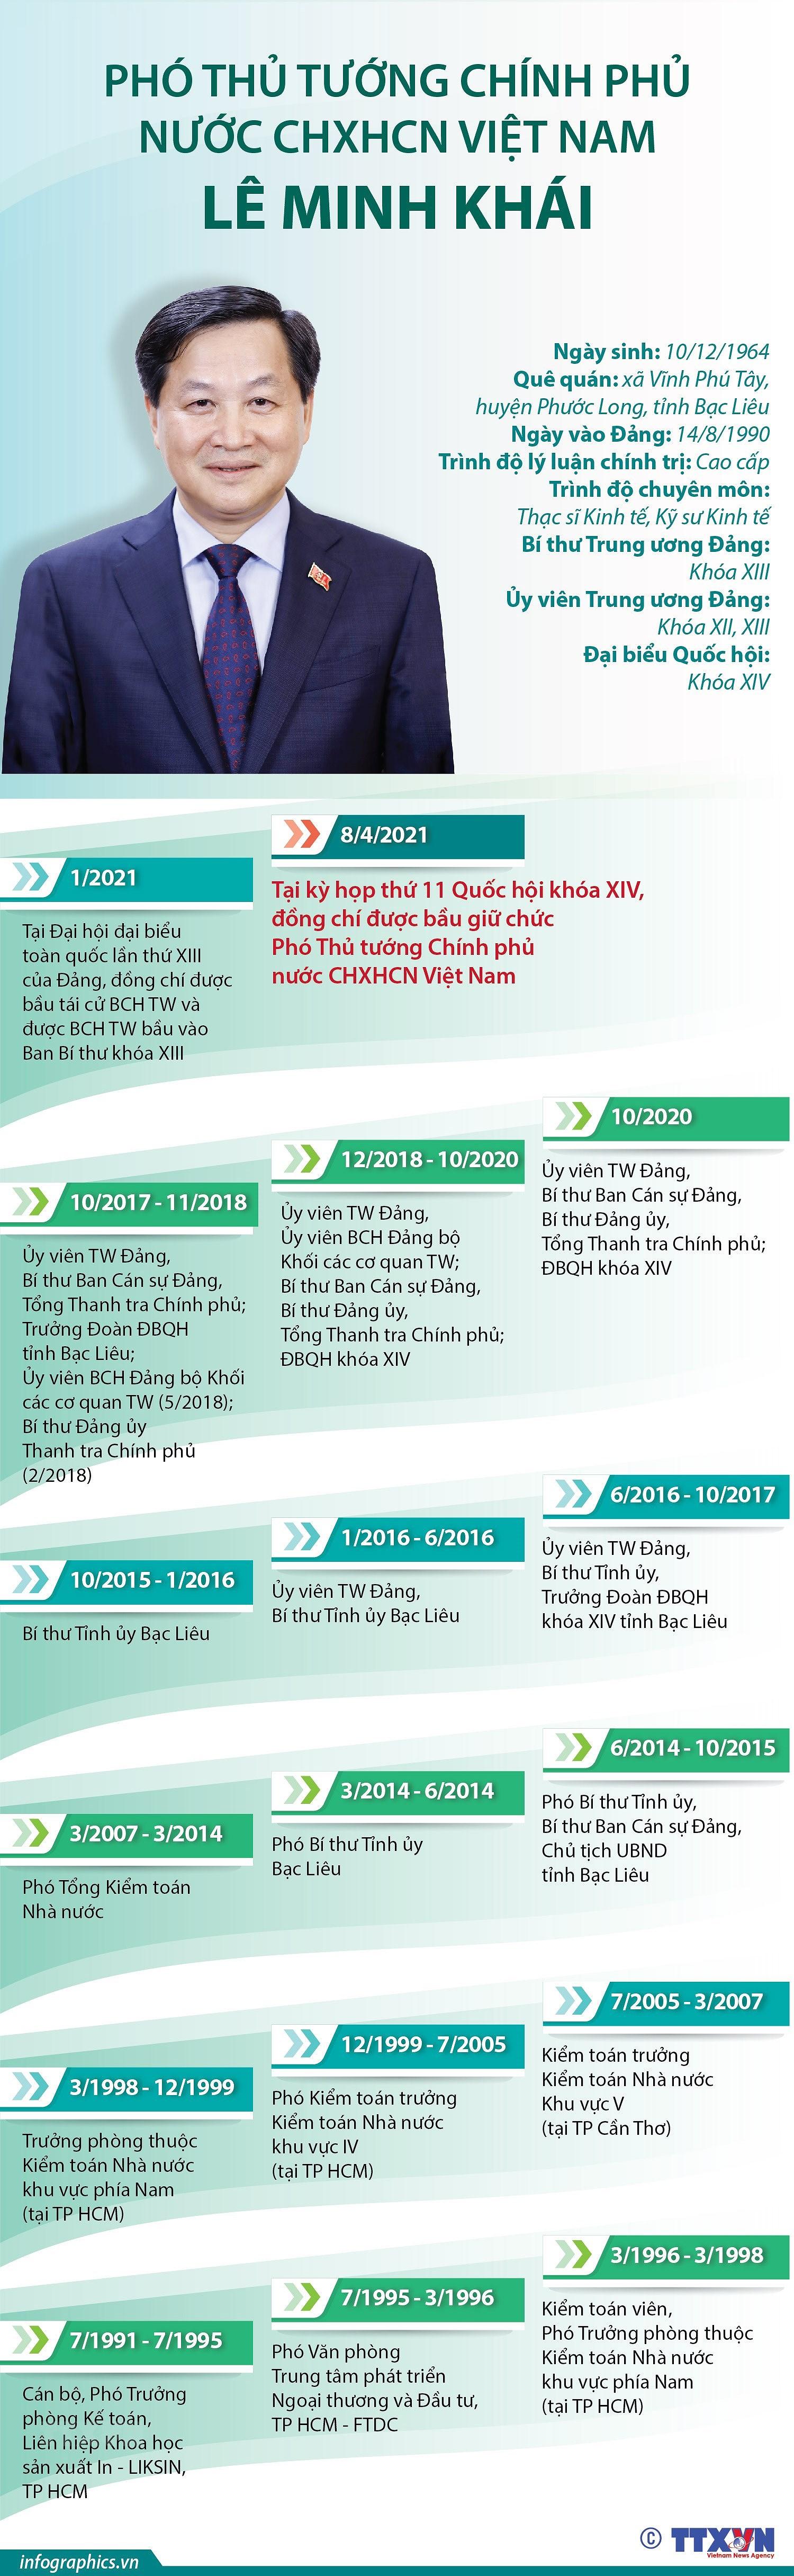 [Infographics] Tieu su tan Pho Thu tuong Chinh phu Le Minh Khai hinh anh 1